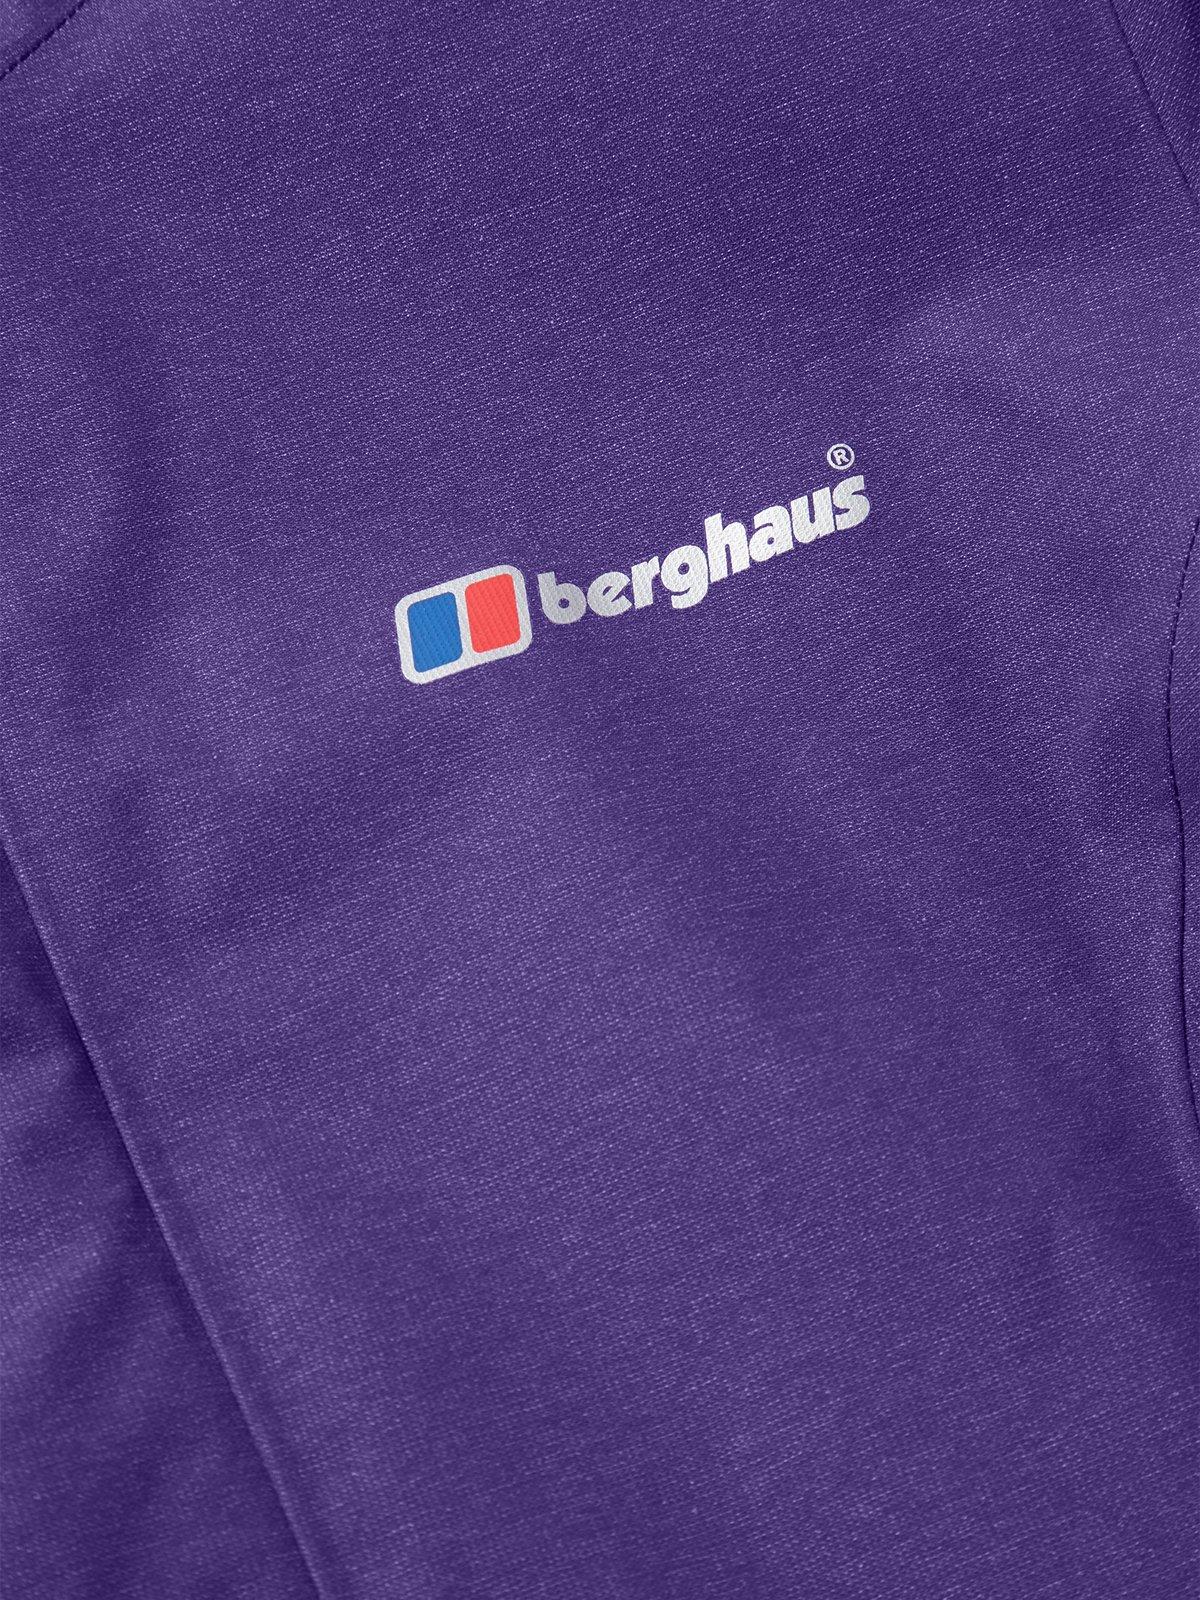 91B16stDT7L - Berghaus Women's Elara Waterproof Jacket